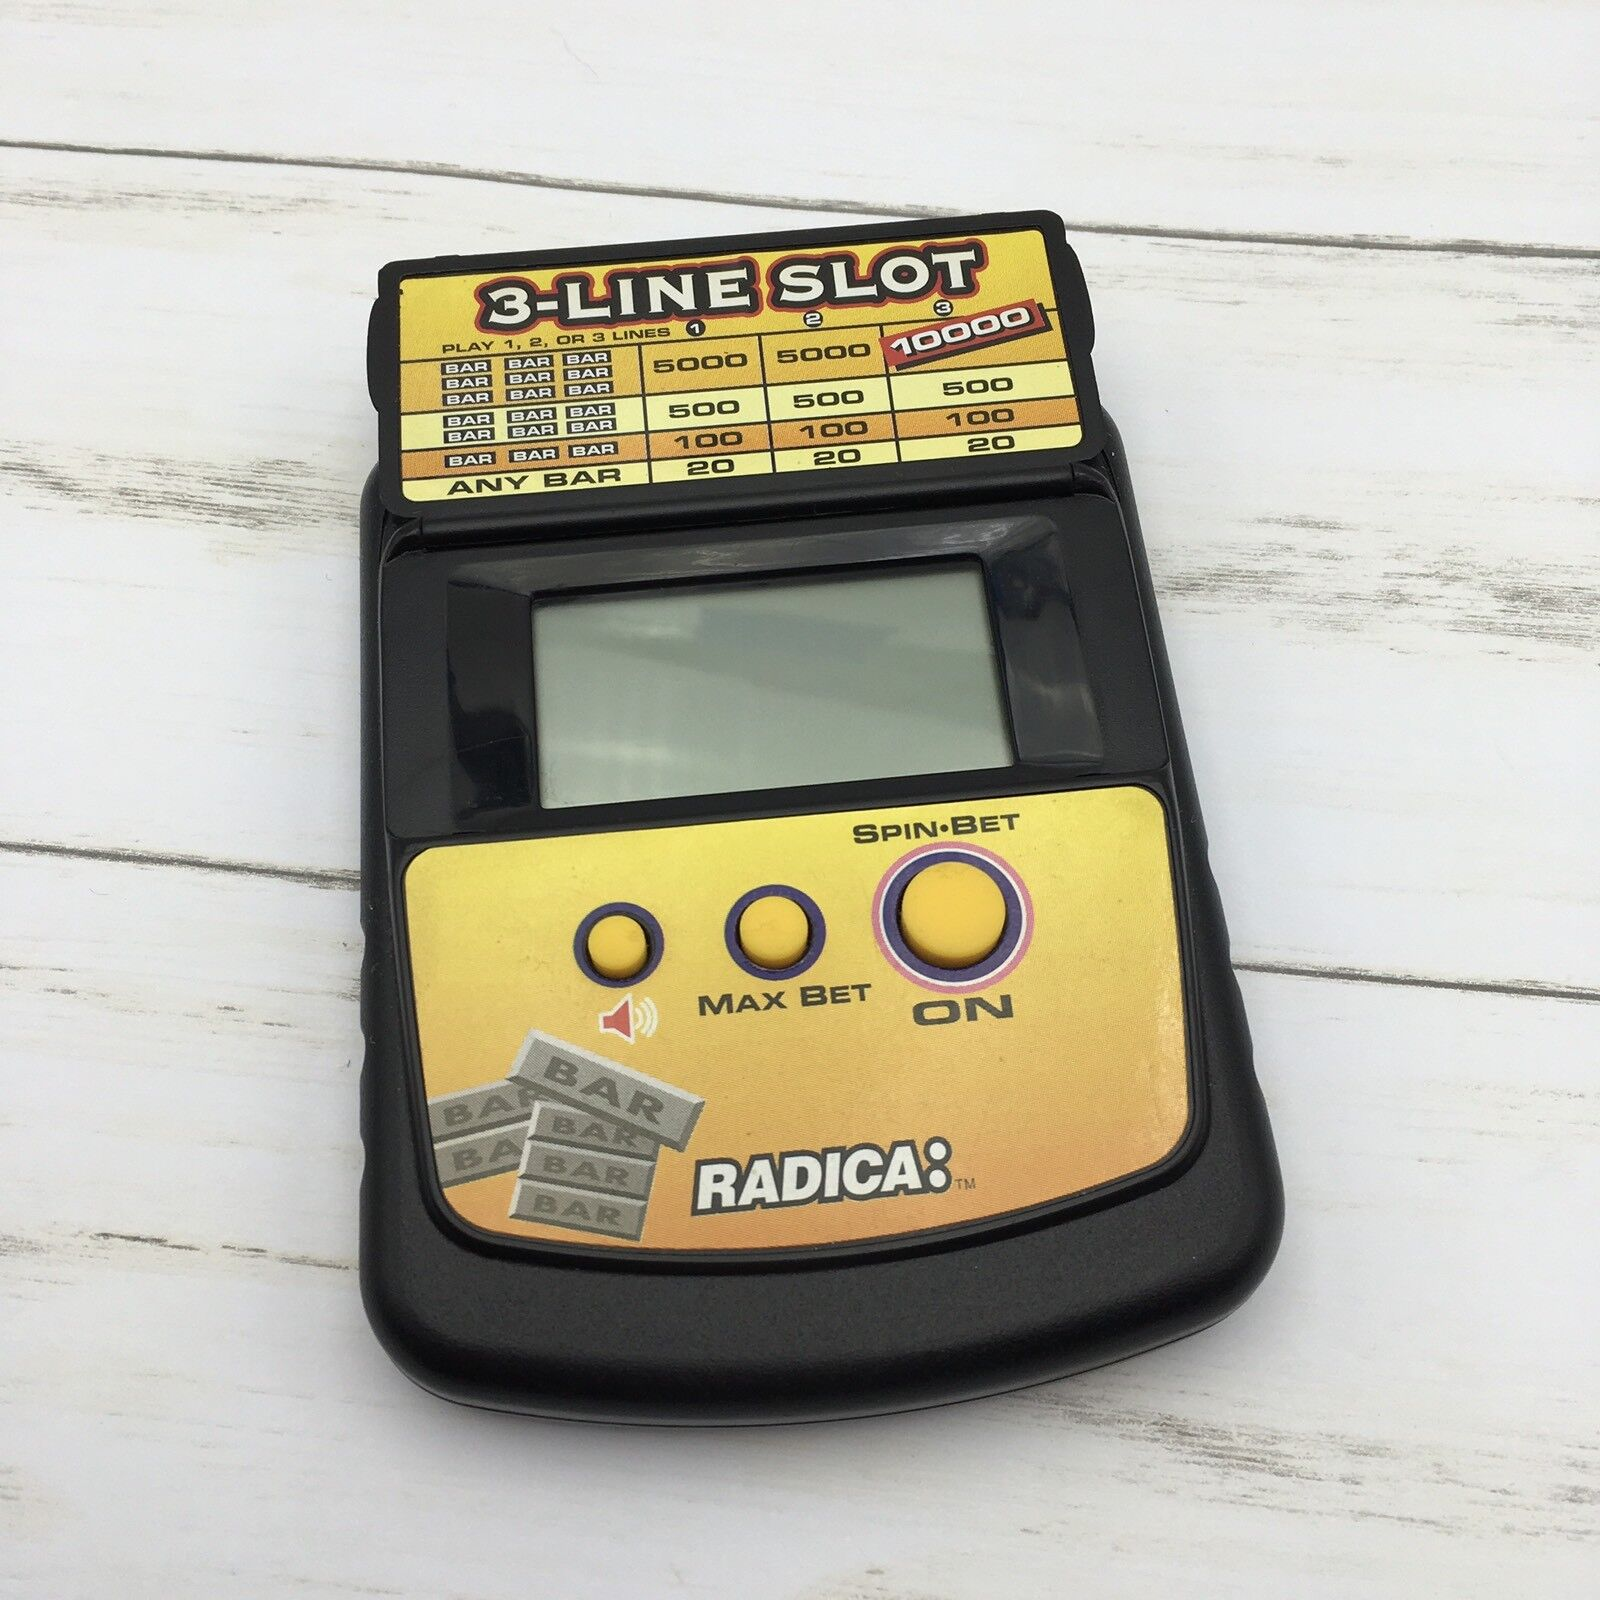 Radica 3-Line Slot Electronic Handheld Model 2871 Casino Game